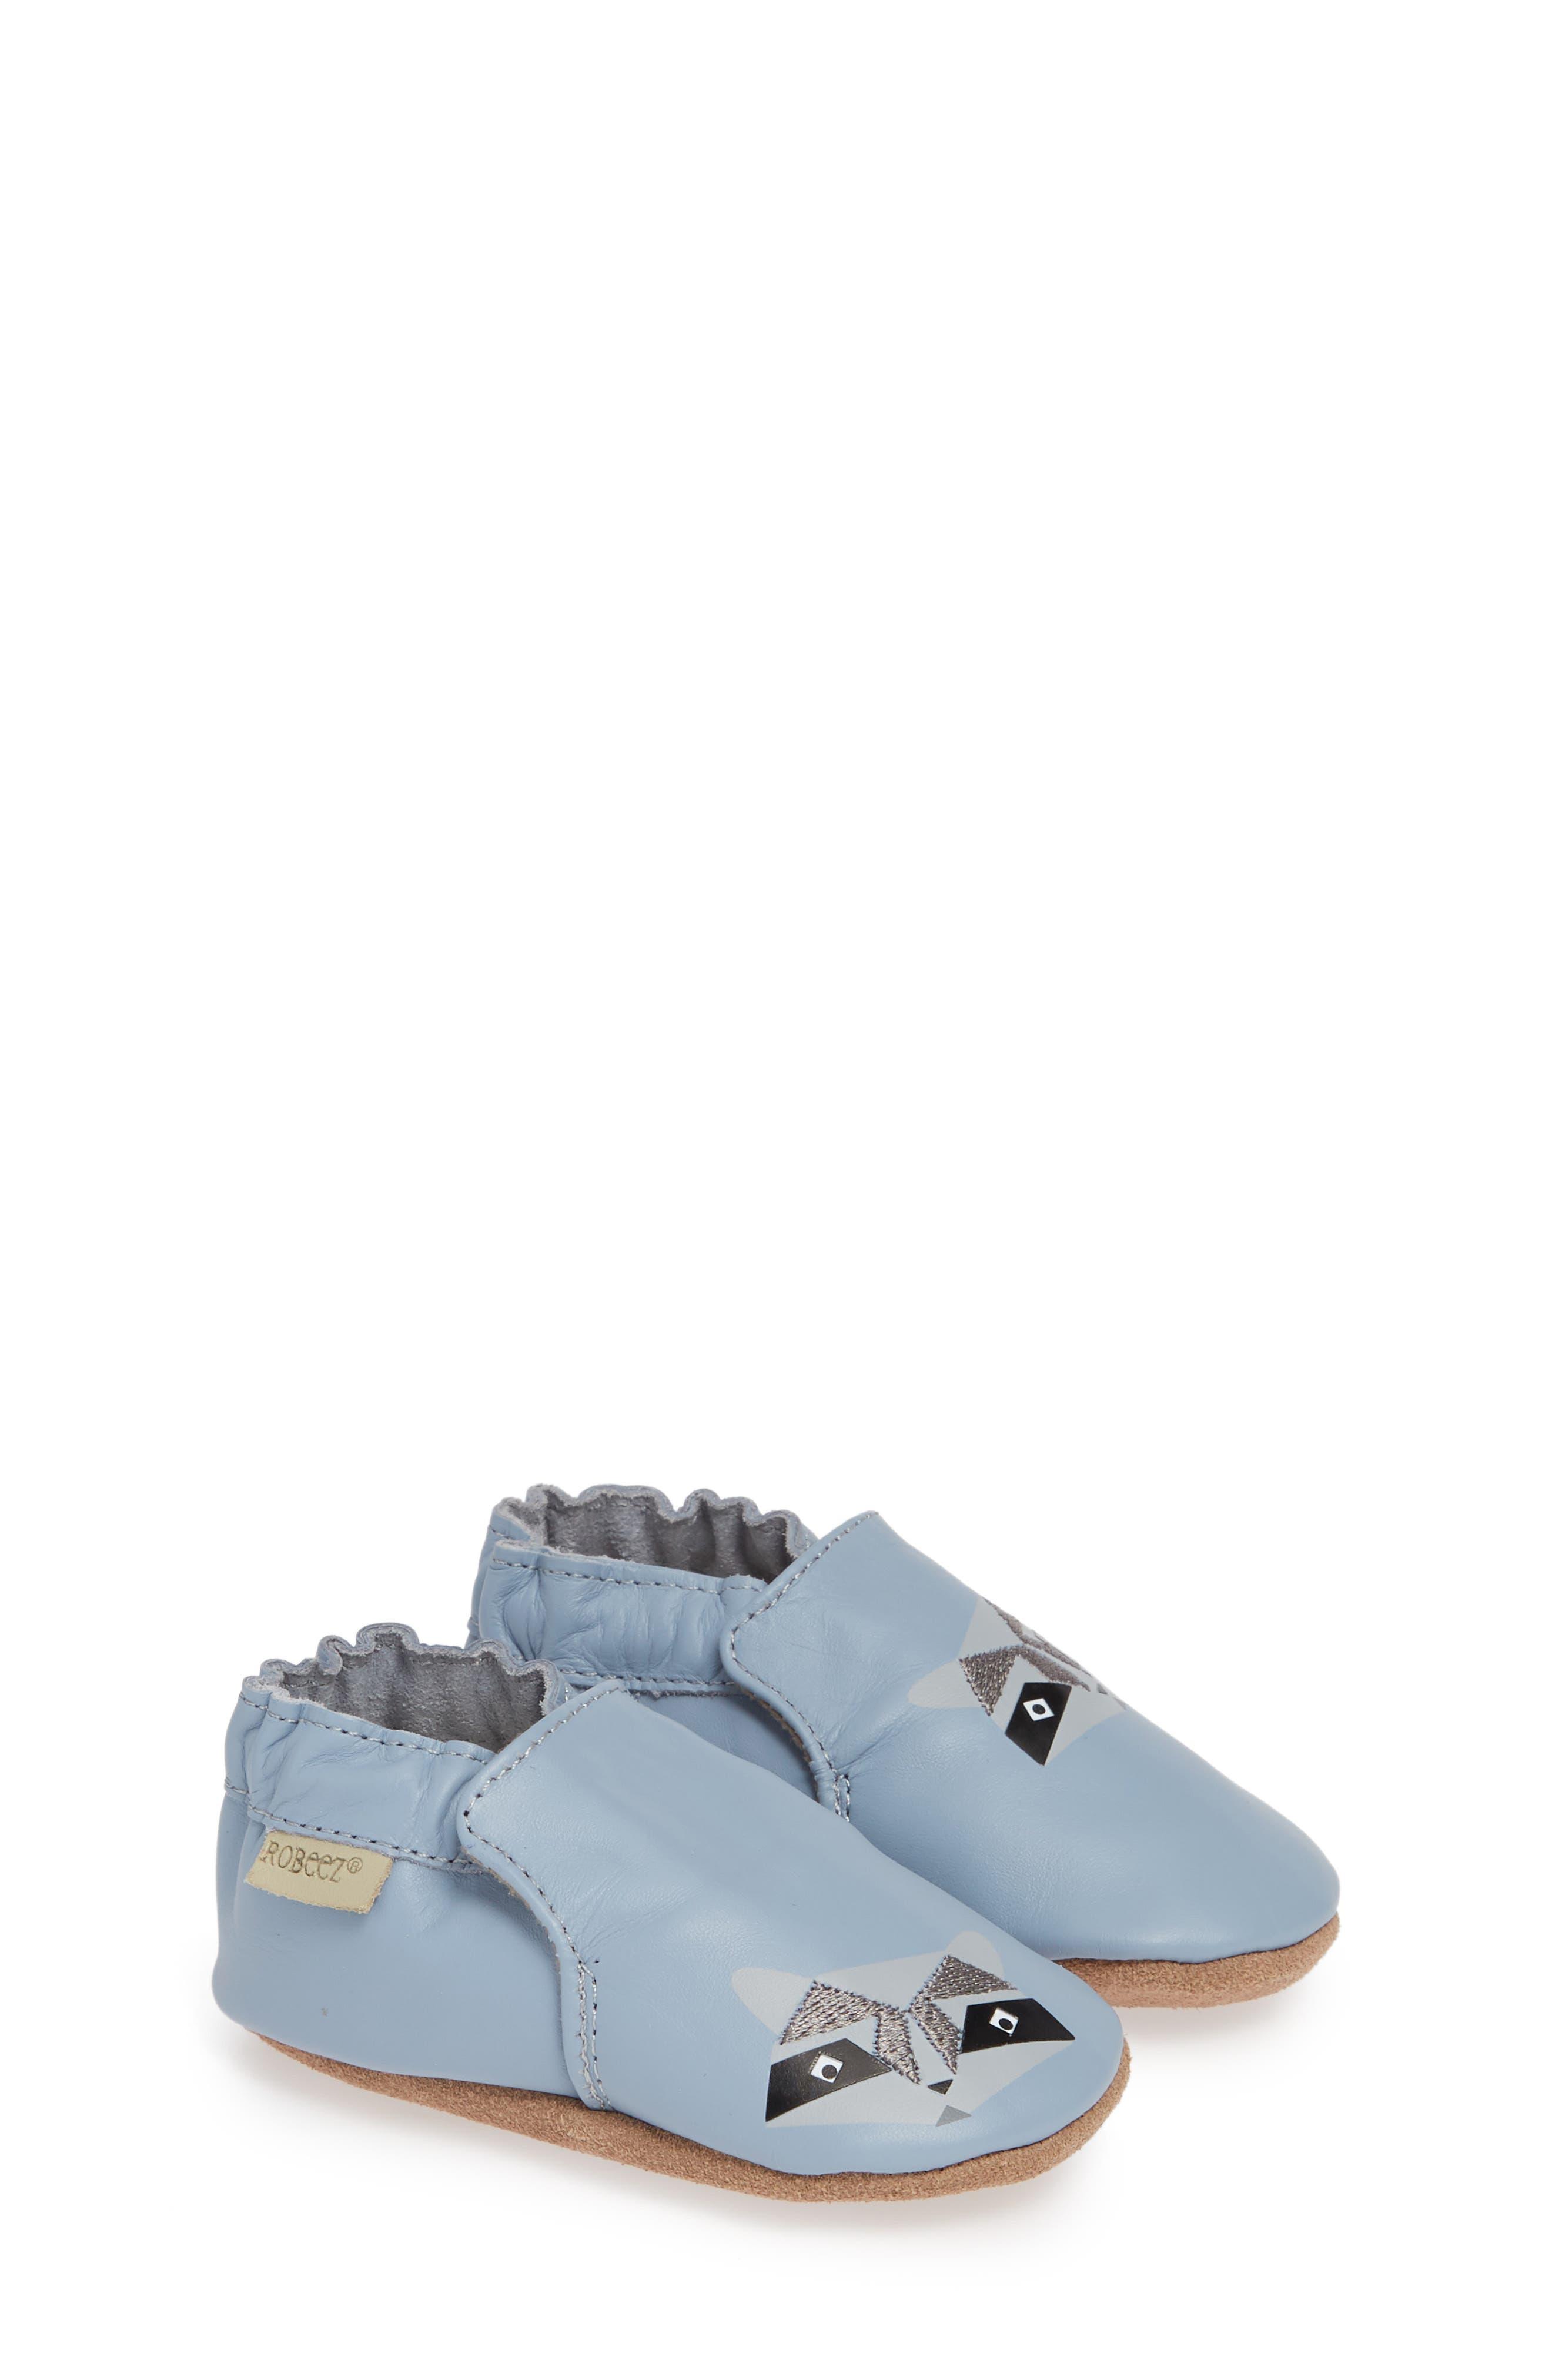 ROBEEZ<SUP>®</SUP>, Raccoon Buddies Crib Shoe, Main thumbnail 1, color, BLUE